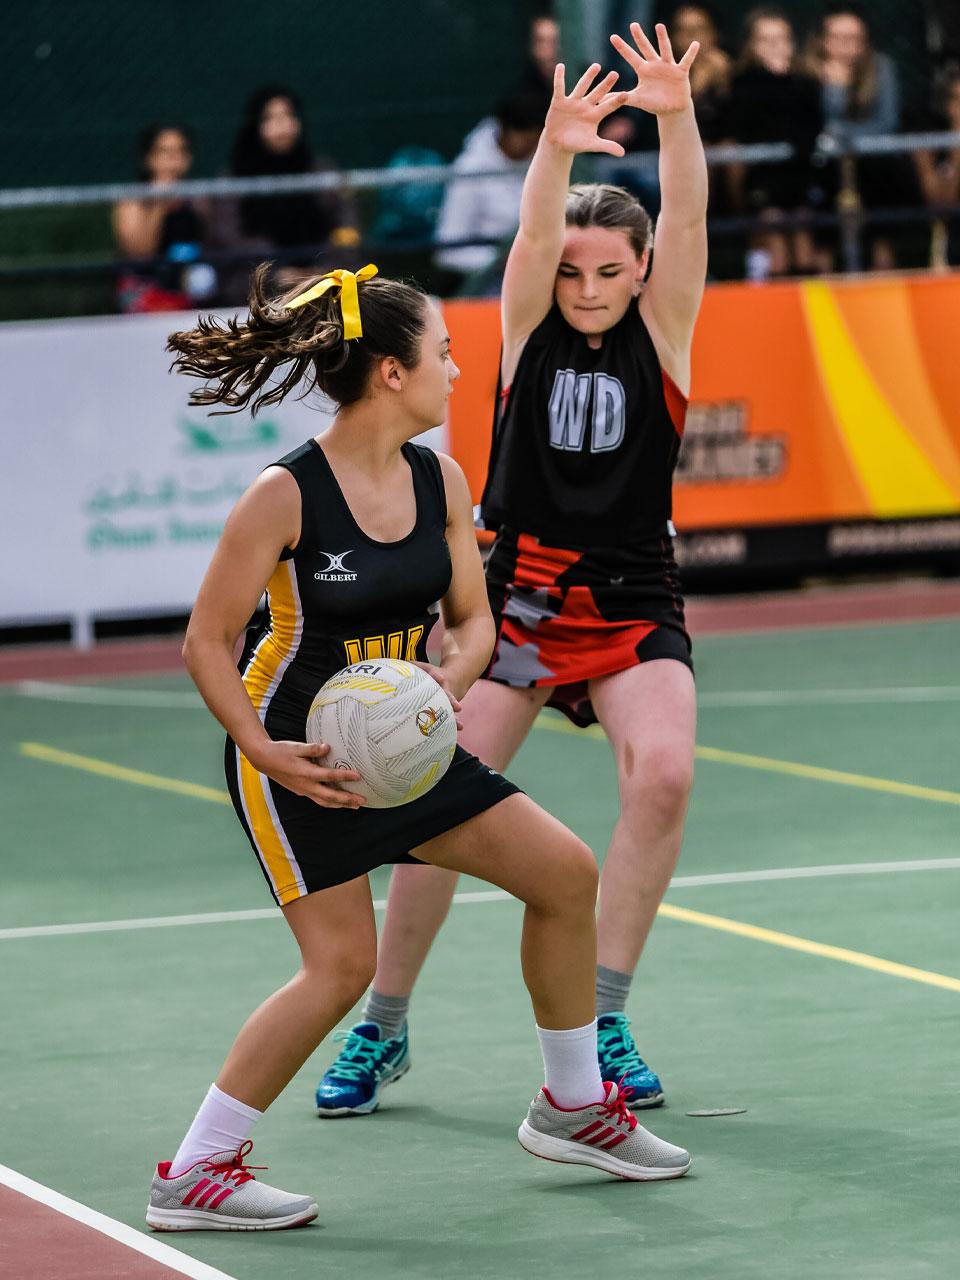 Girls playing Netball in Dubai